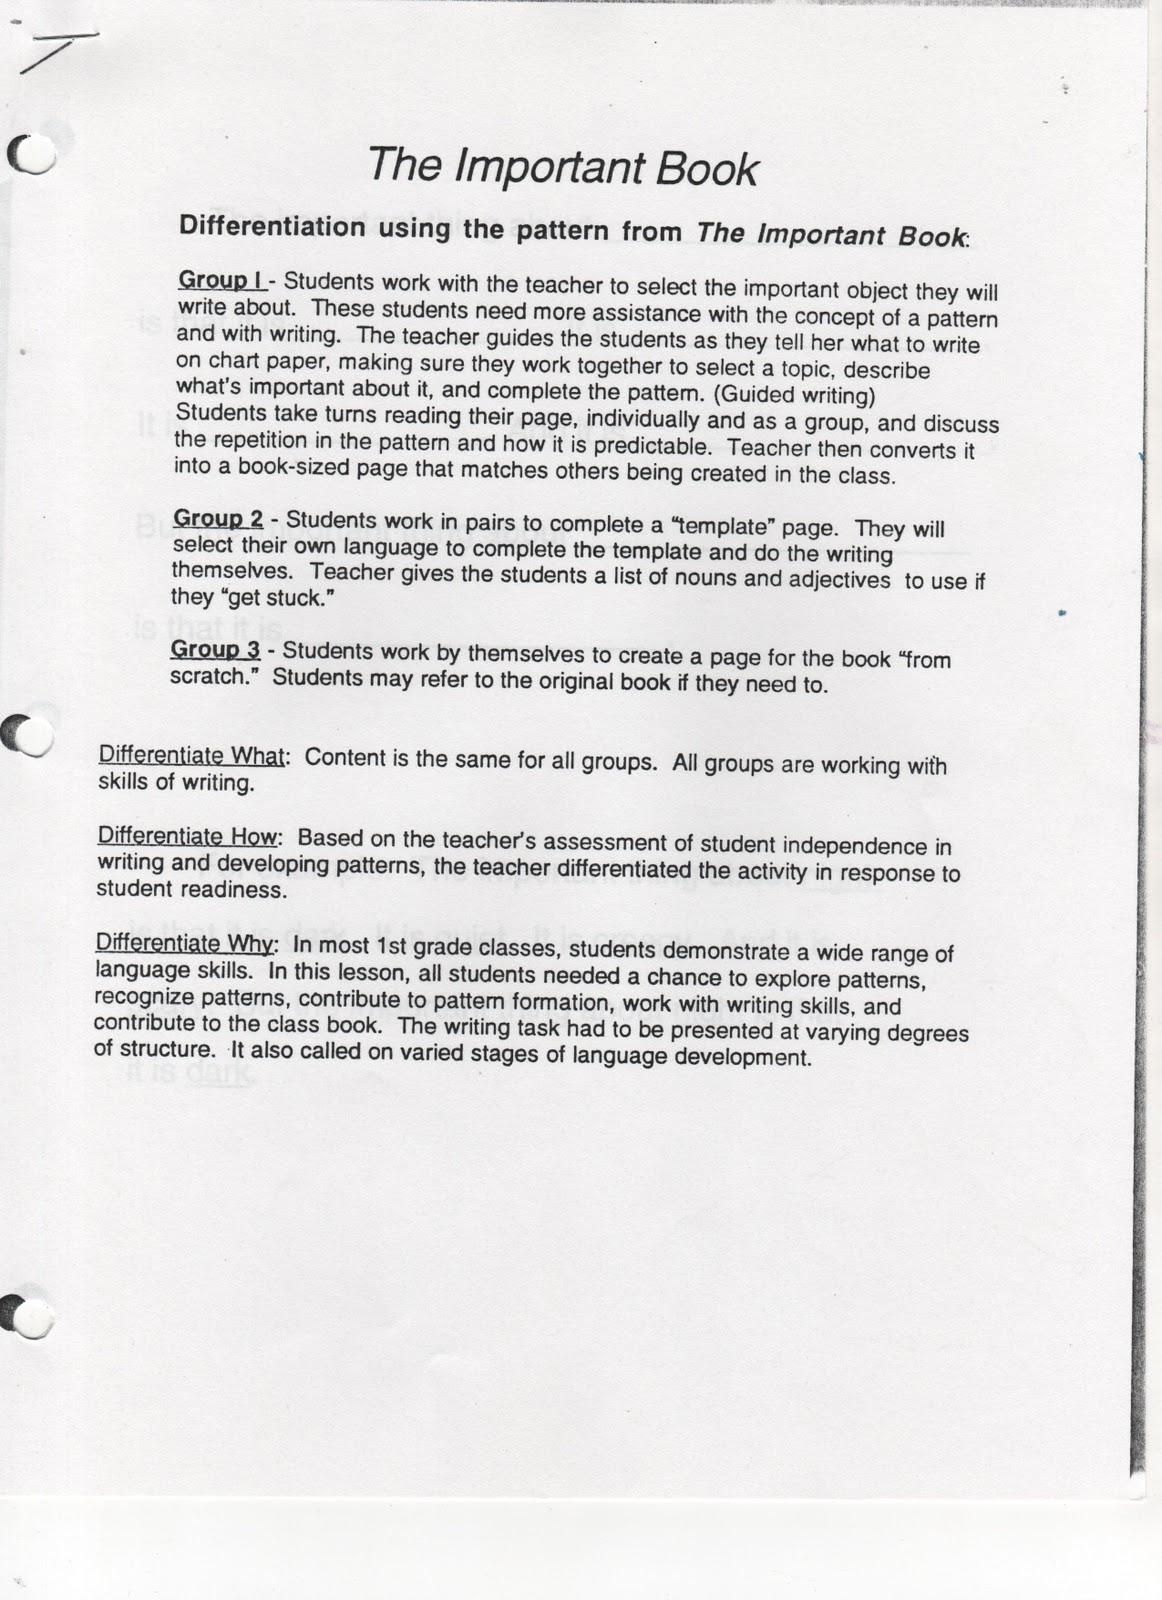 ELEMENTARY SCHOOL ENRICHMENT ACTIVITIES: January 2009